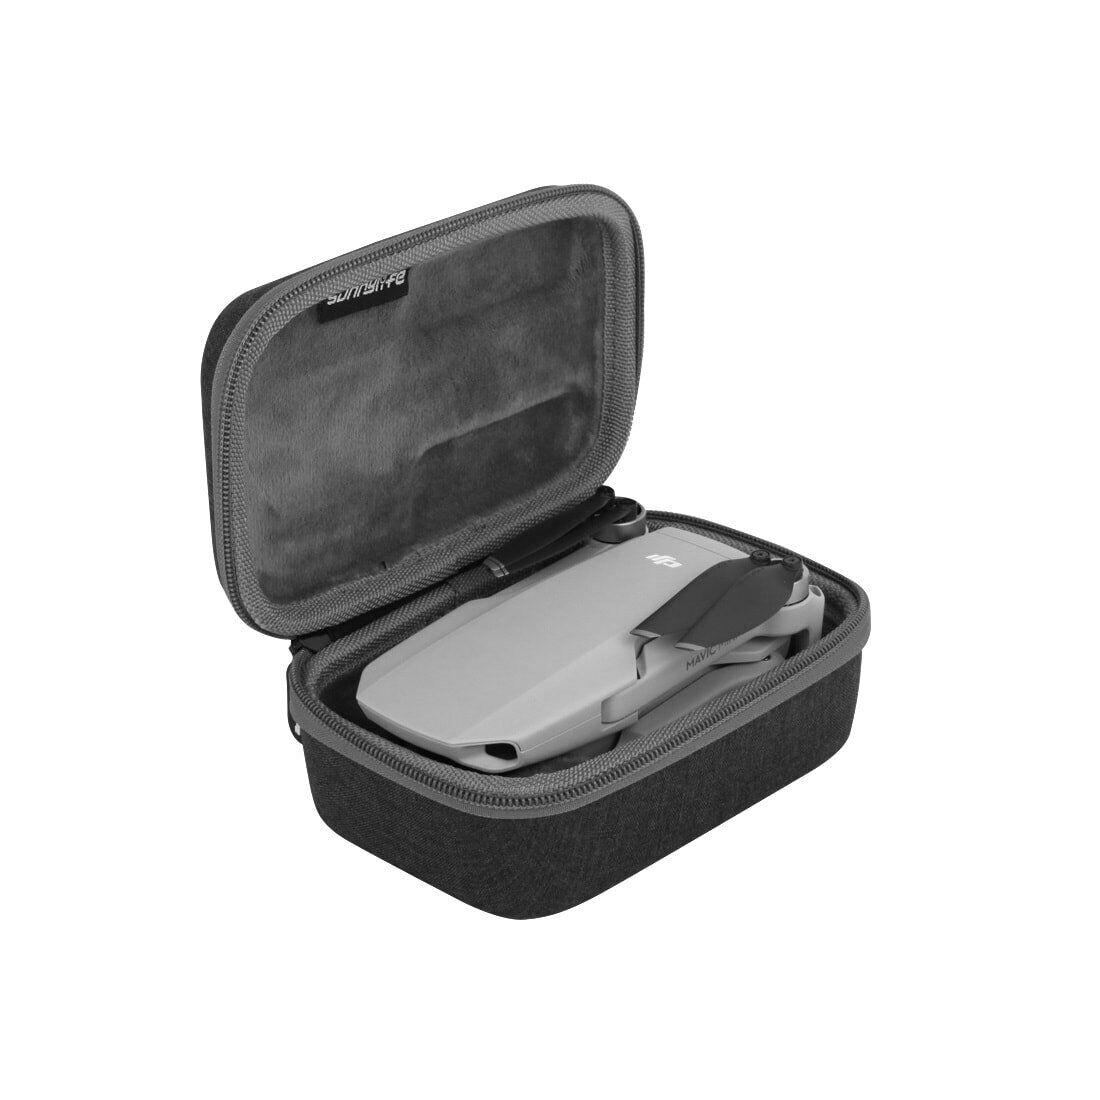 Storage Bag Carry Case for Mavic Mini Drone Body